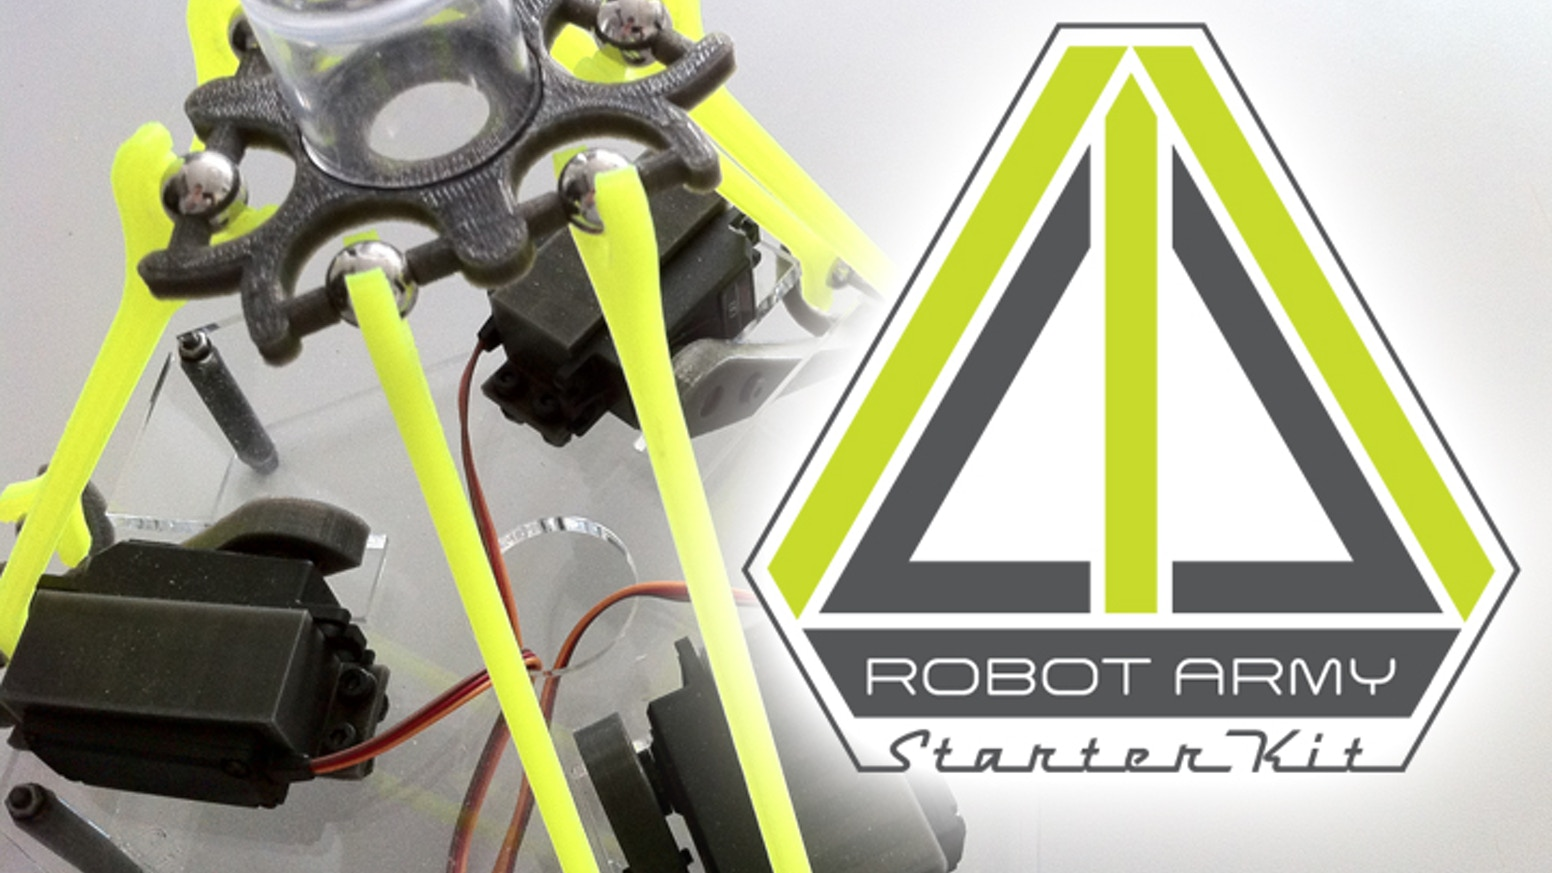 Robot army starter kit by robot army llc kickstarter a do it yourself delta robot kit thats fun to build sharp to solutioingenieria Gallery